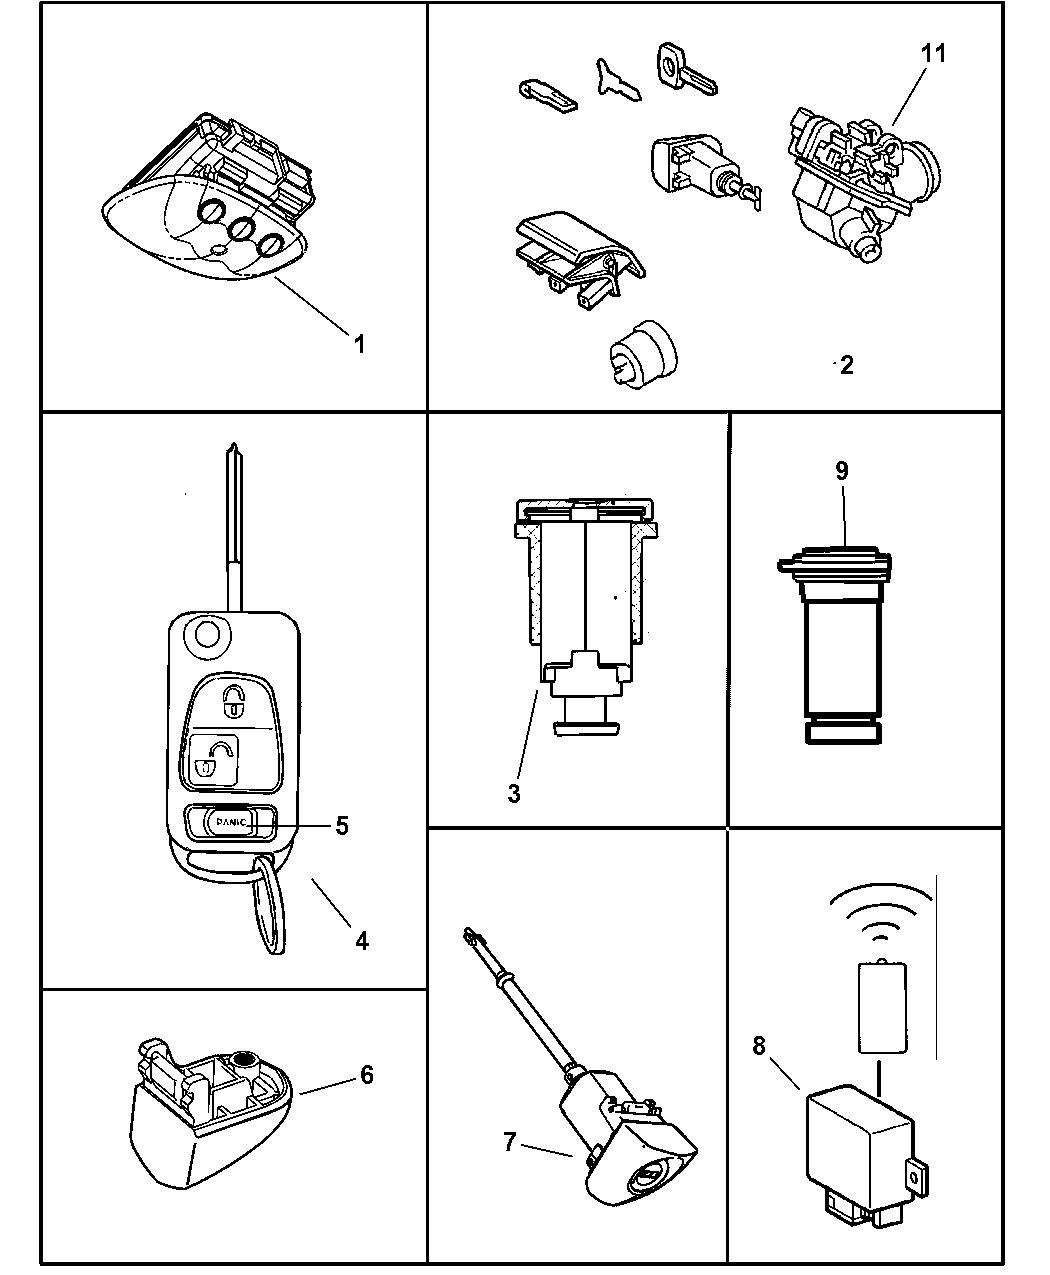 mopar 5099541aa  diagram of chrysler lock cyl #12